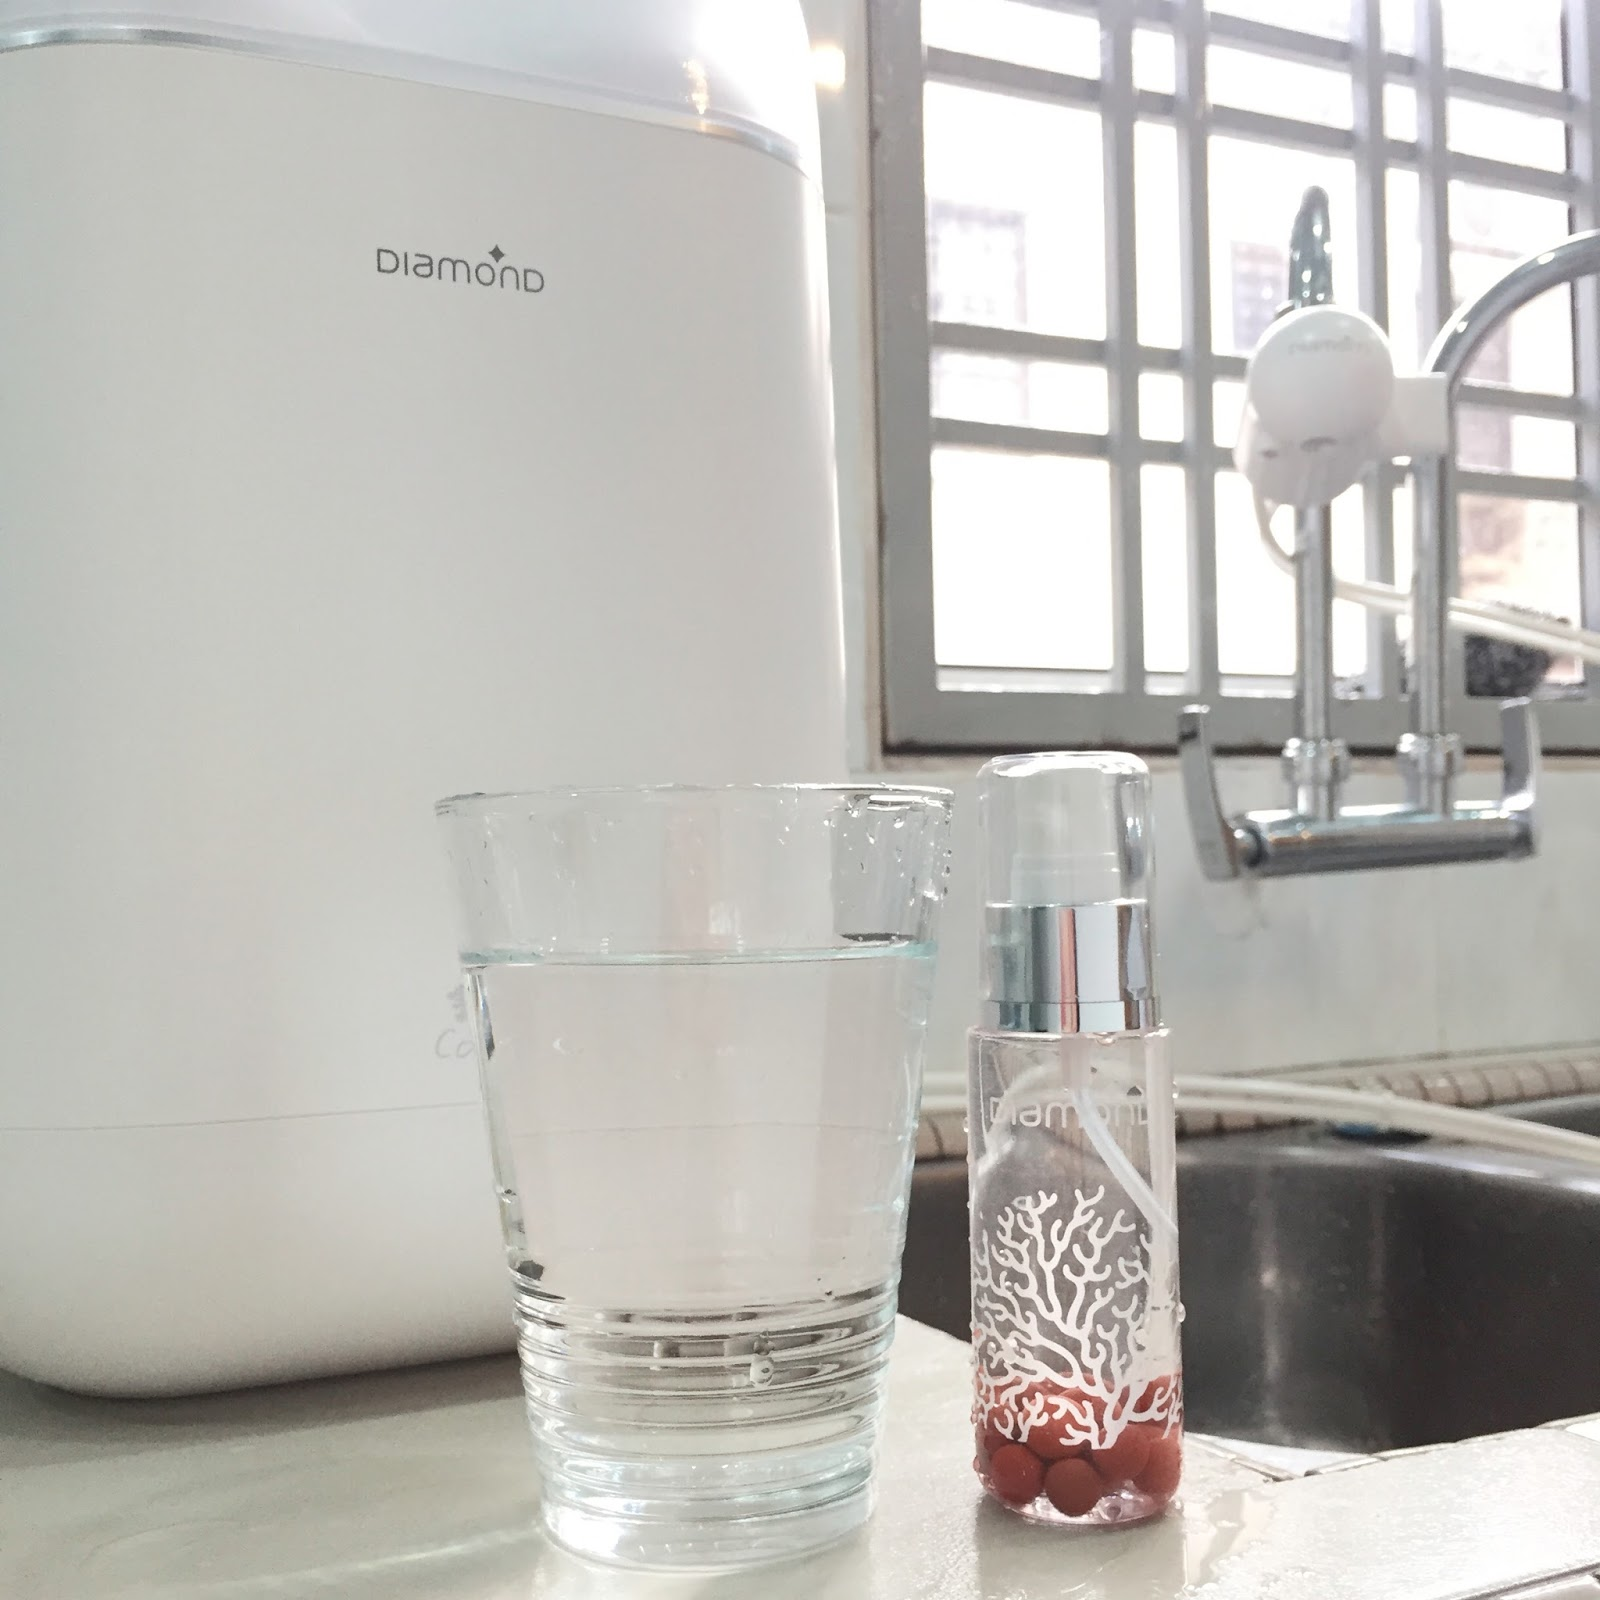 Diamond 珊瑚堿性水 Coral Alkaline Water™ —— 內外兼備高顏值的凈水機 X Diamond Coral Waterbar —— 1秒就愛上3秒即暖飲水機 ...